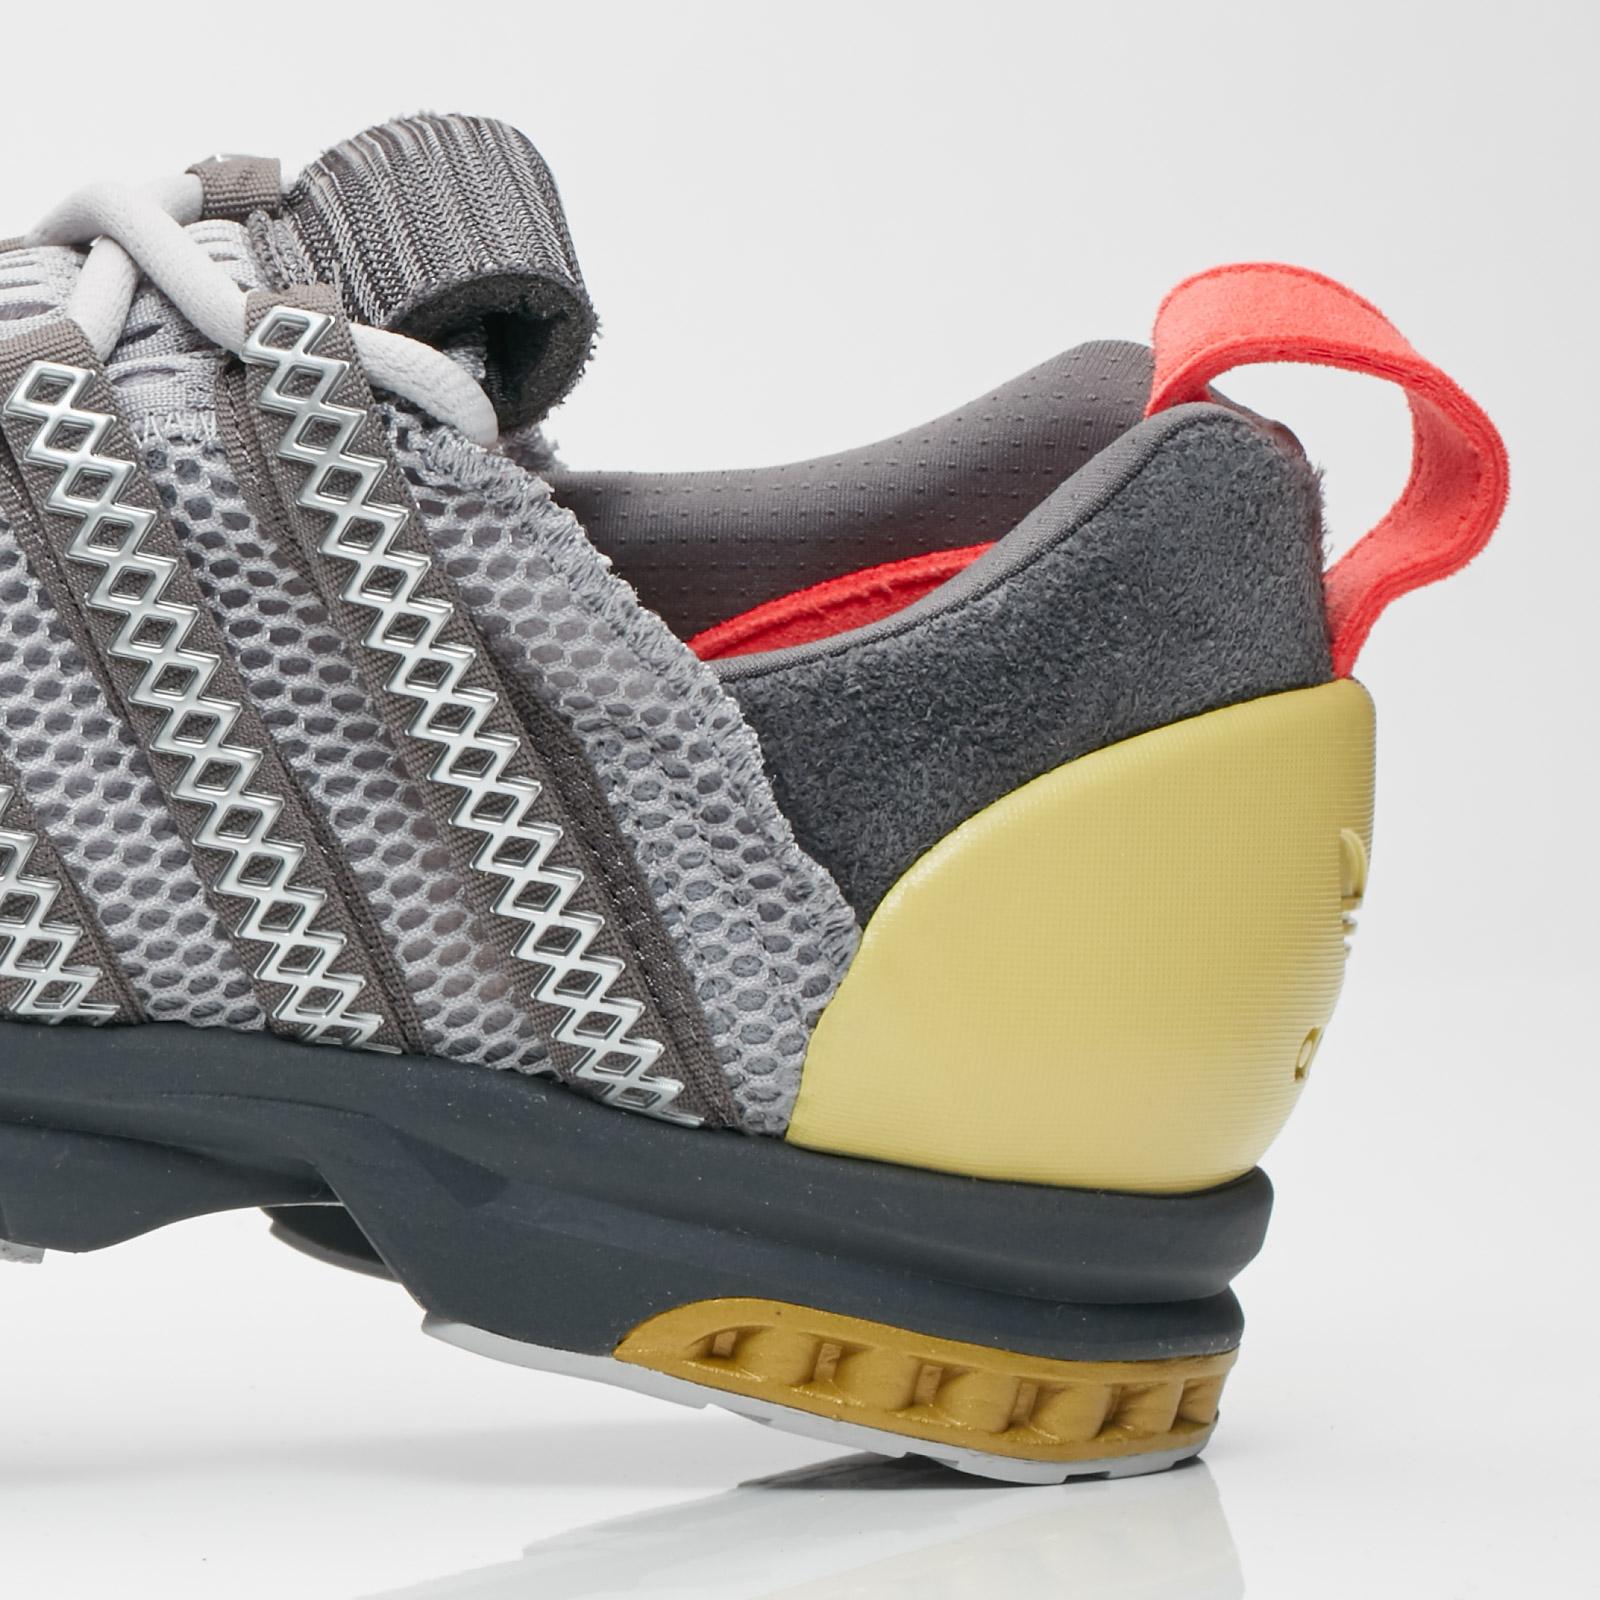 innovative design f1c36 f58b2 ... adidas Consortium Adistar Comp AD ...